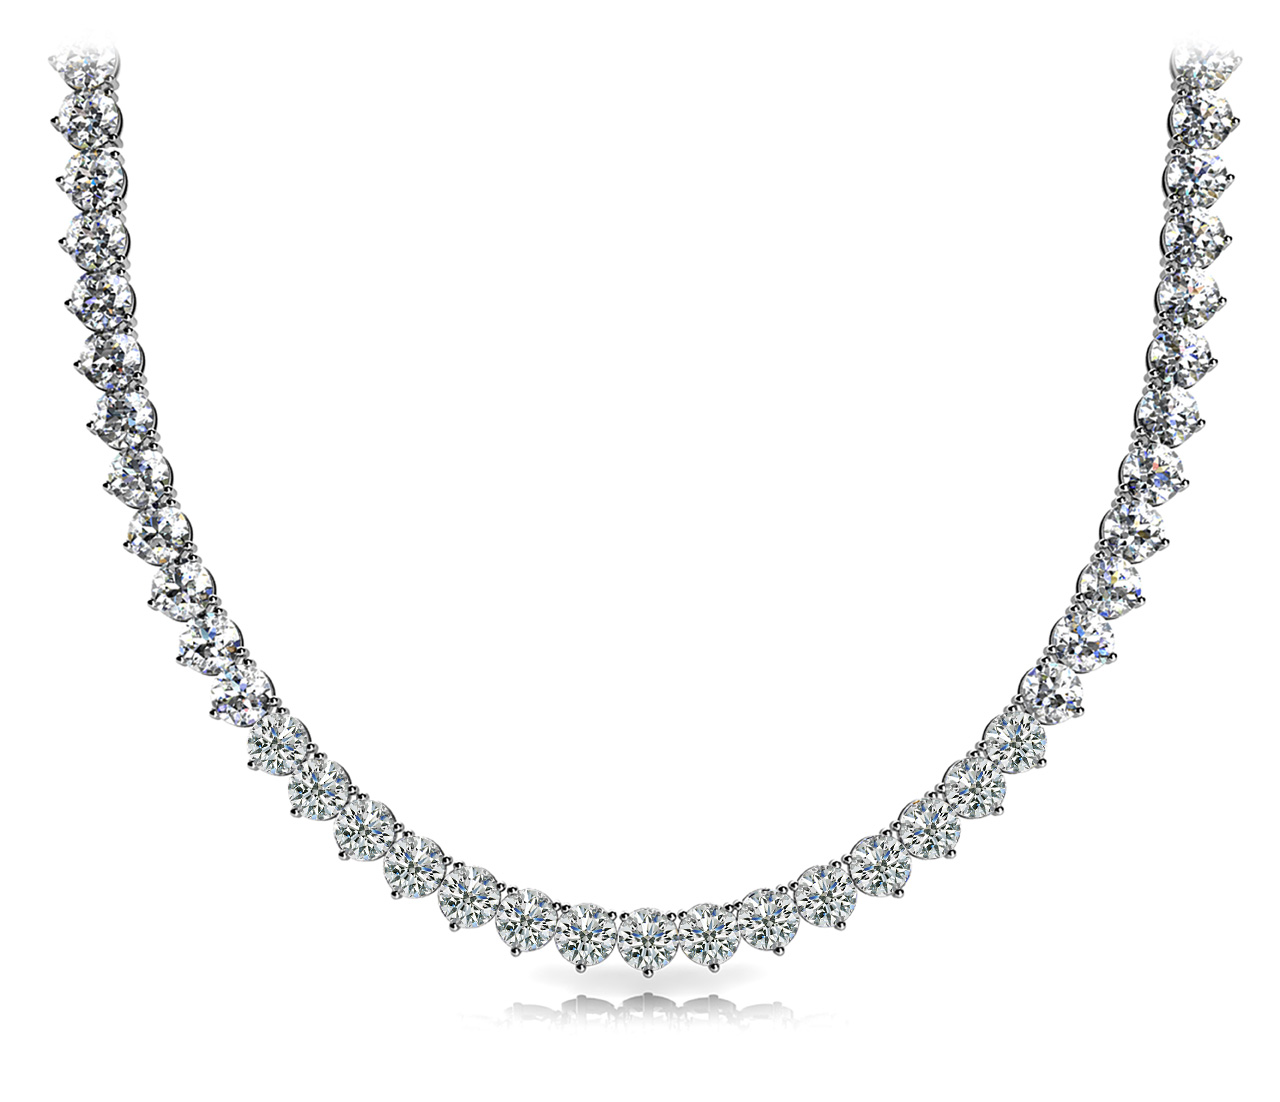 14k-white-gold-eternity-diamond-necklace-60024-10